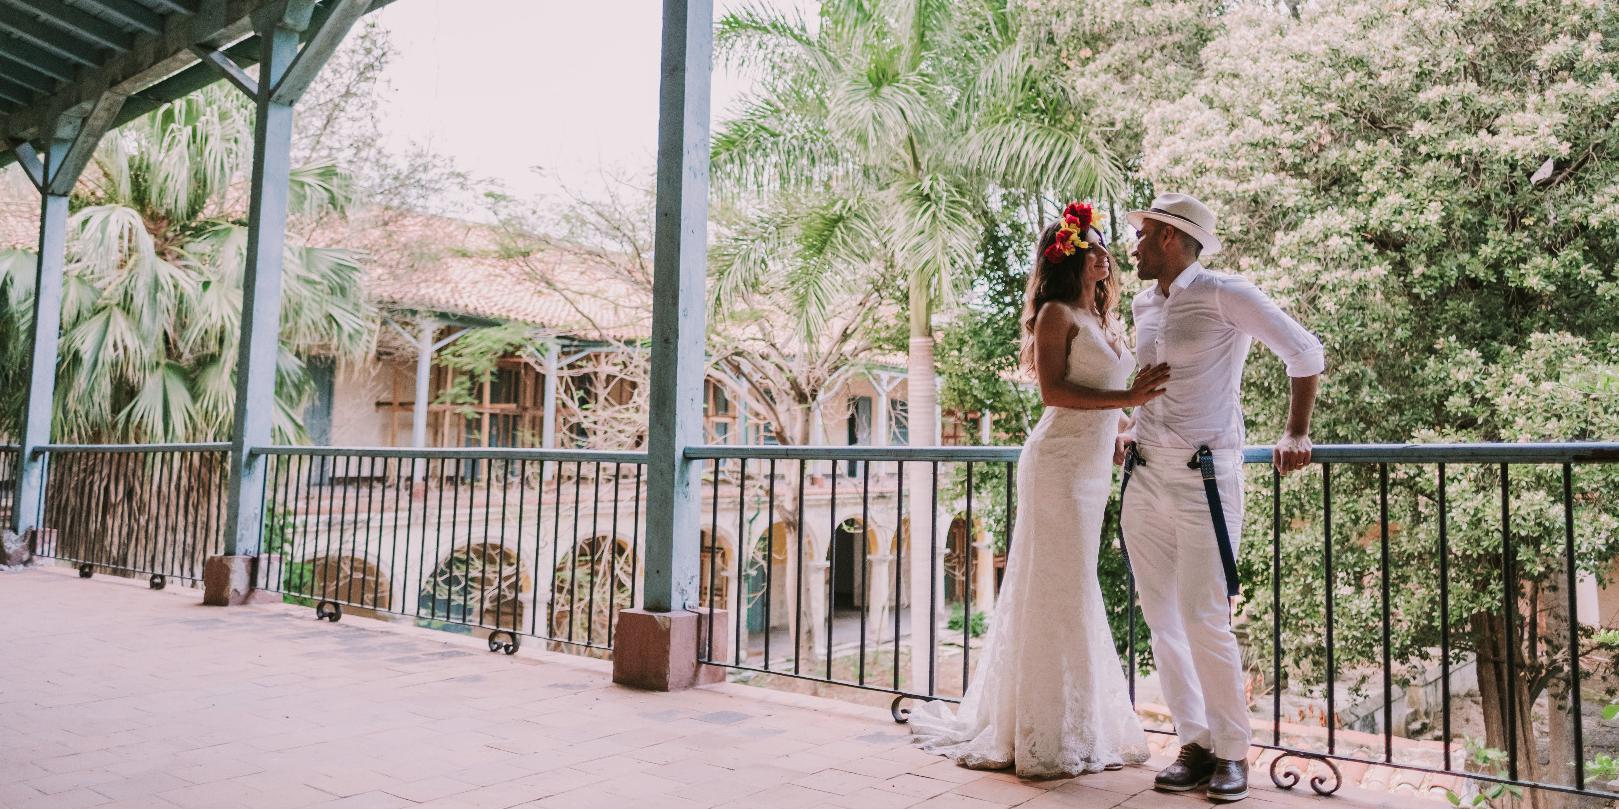 bodas-sin-clasificar-sin-tema-cuba-28981.jpg